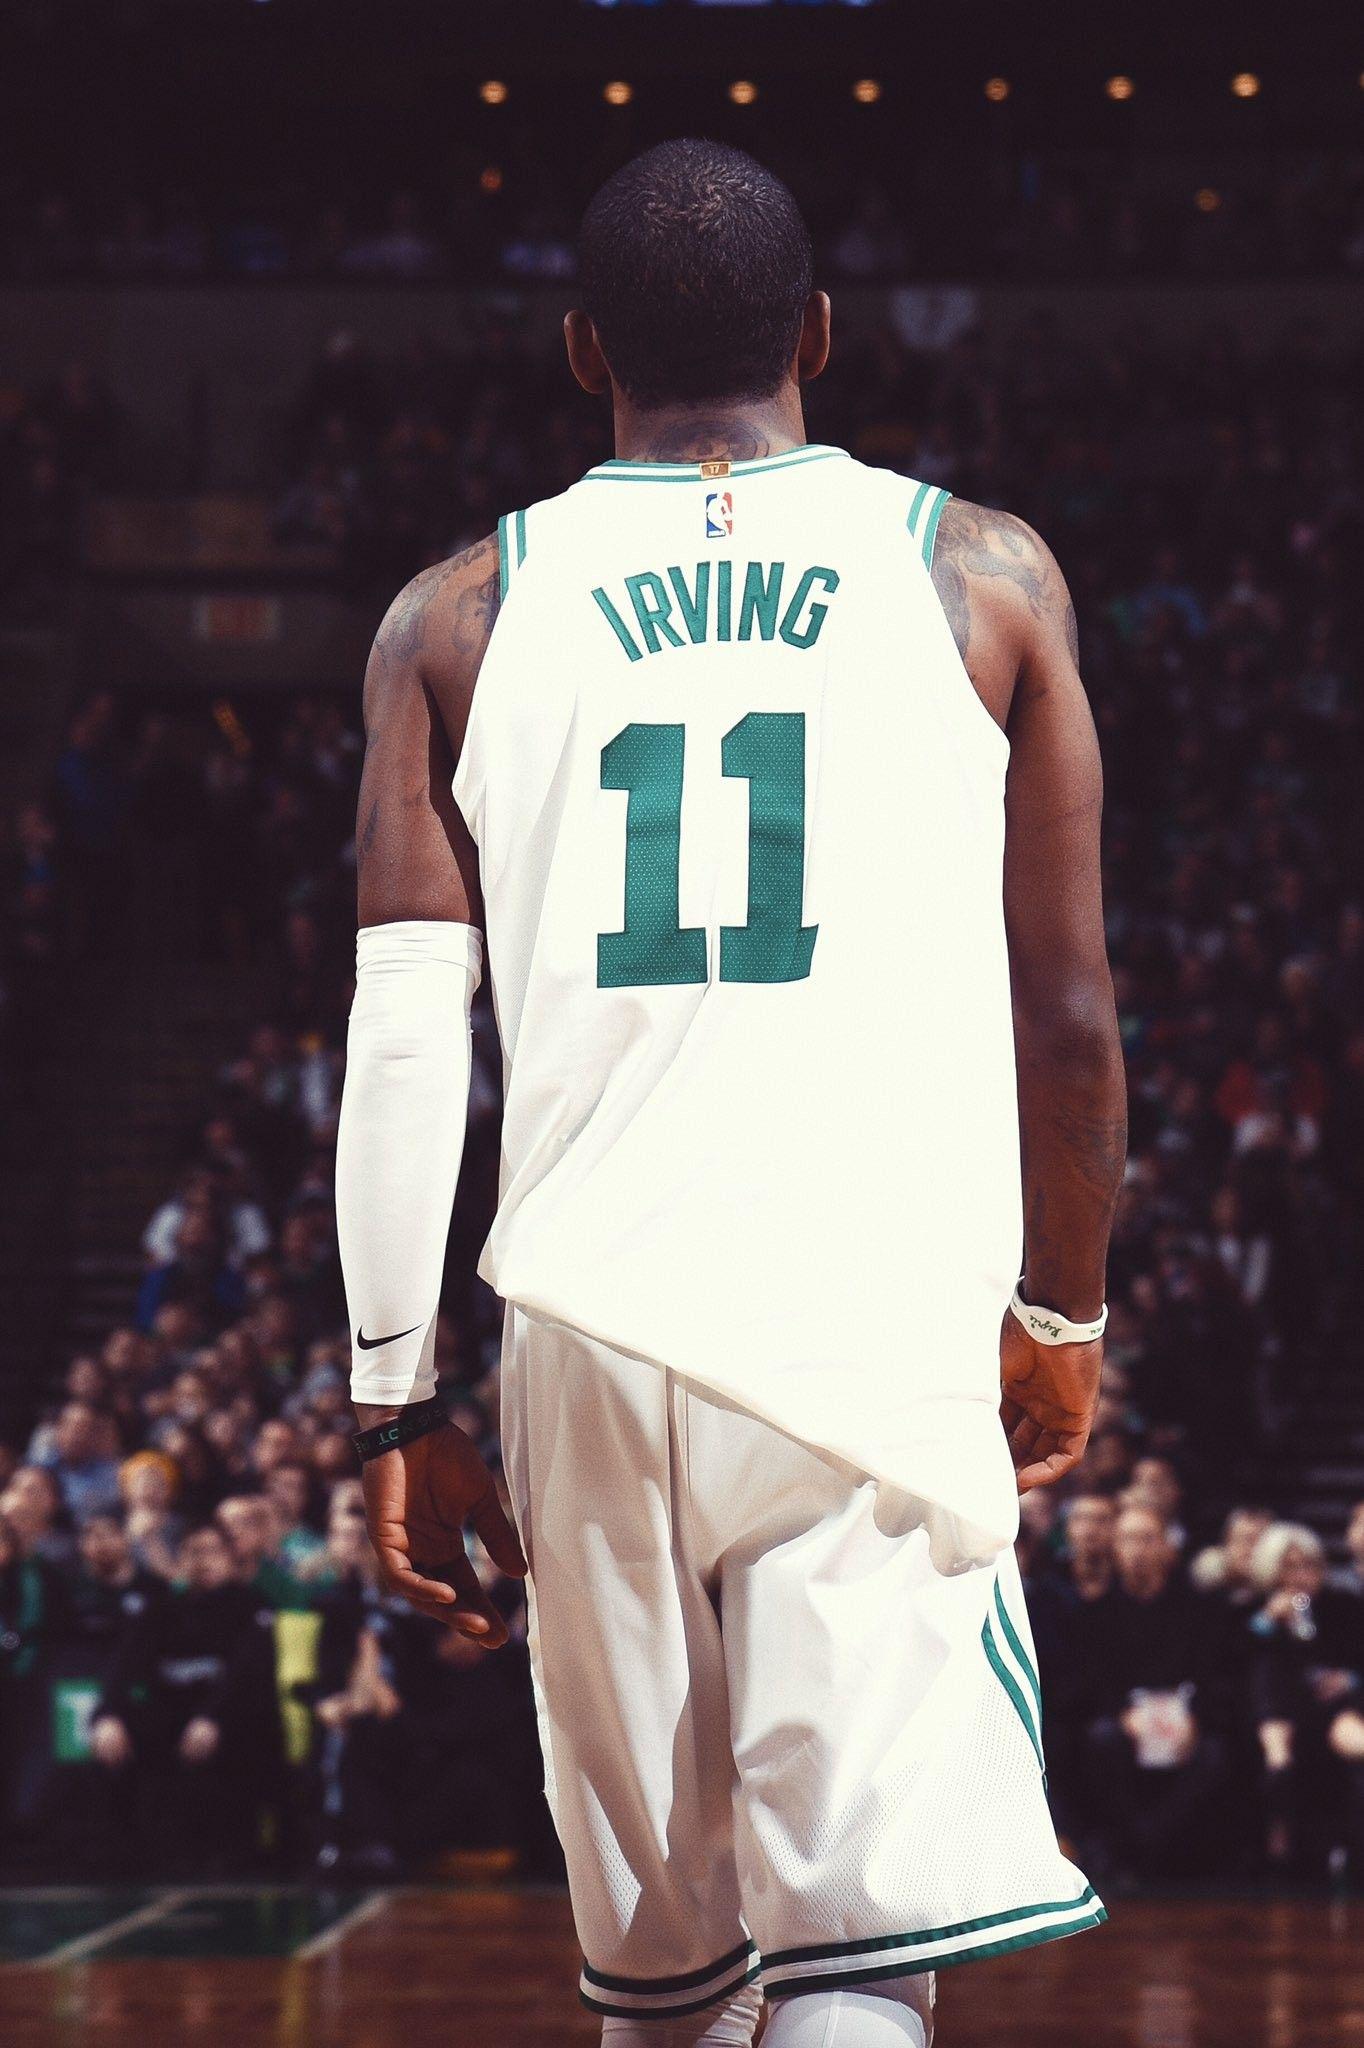 Irving 11 layup king Irving nba Kyrie irving celtics 1364x2048